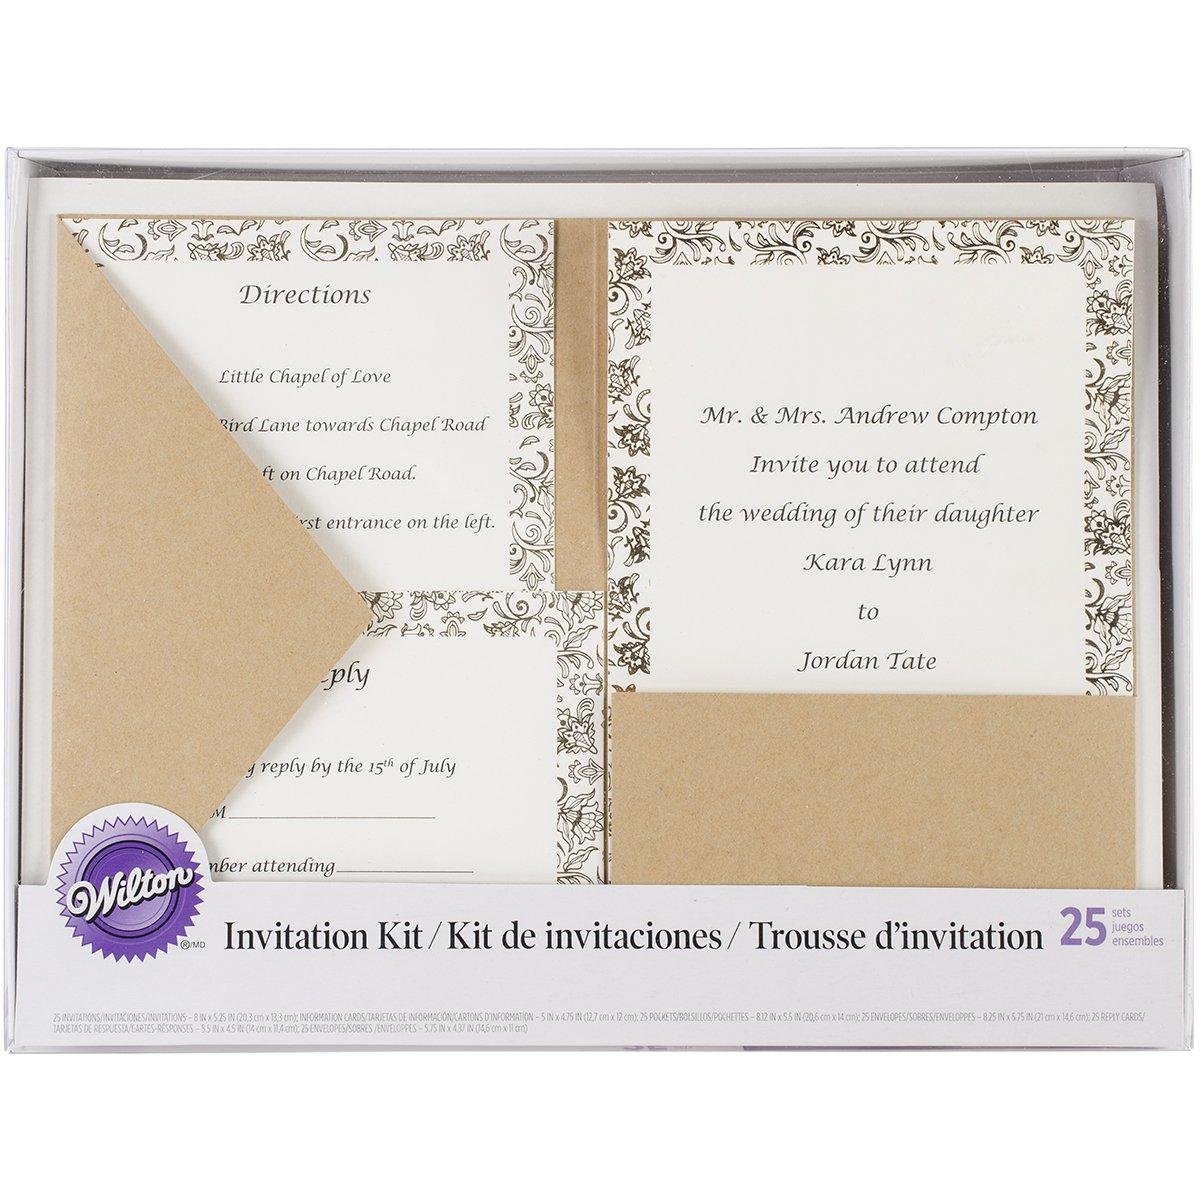 Amazon Wilton 1008 8956 Kraft Pocket Invitation Kit For Wedding 25 Pack Home Kitchen